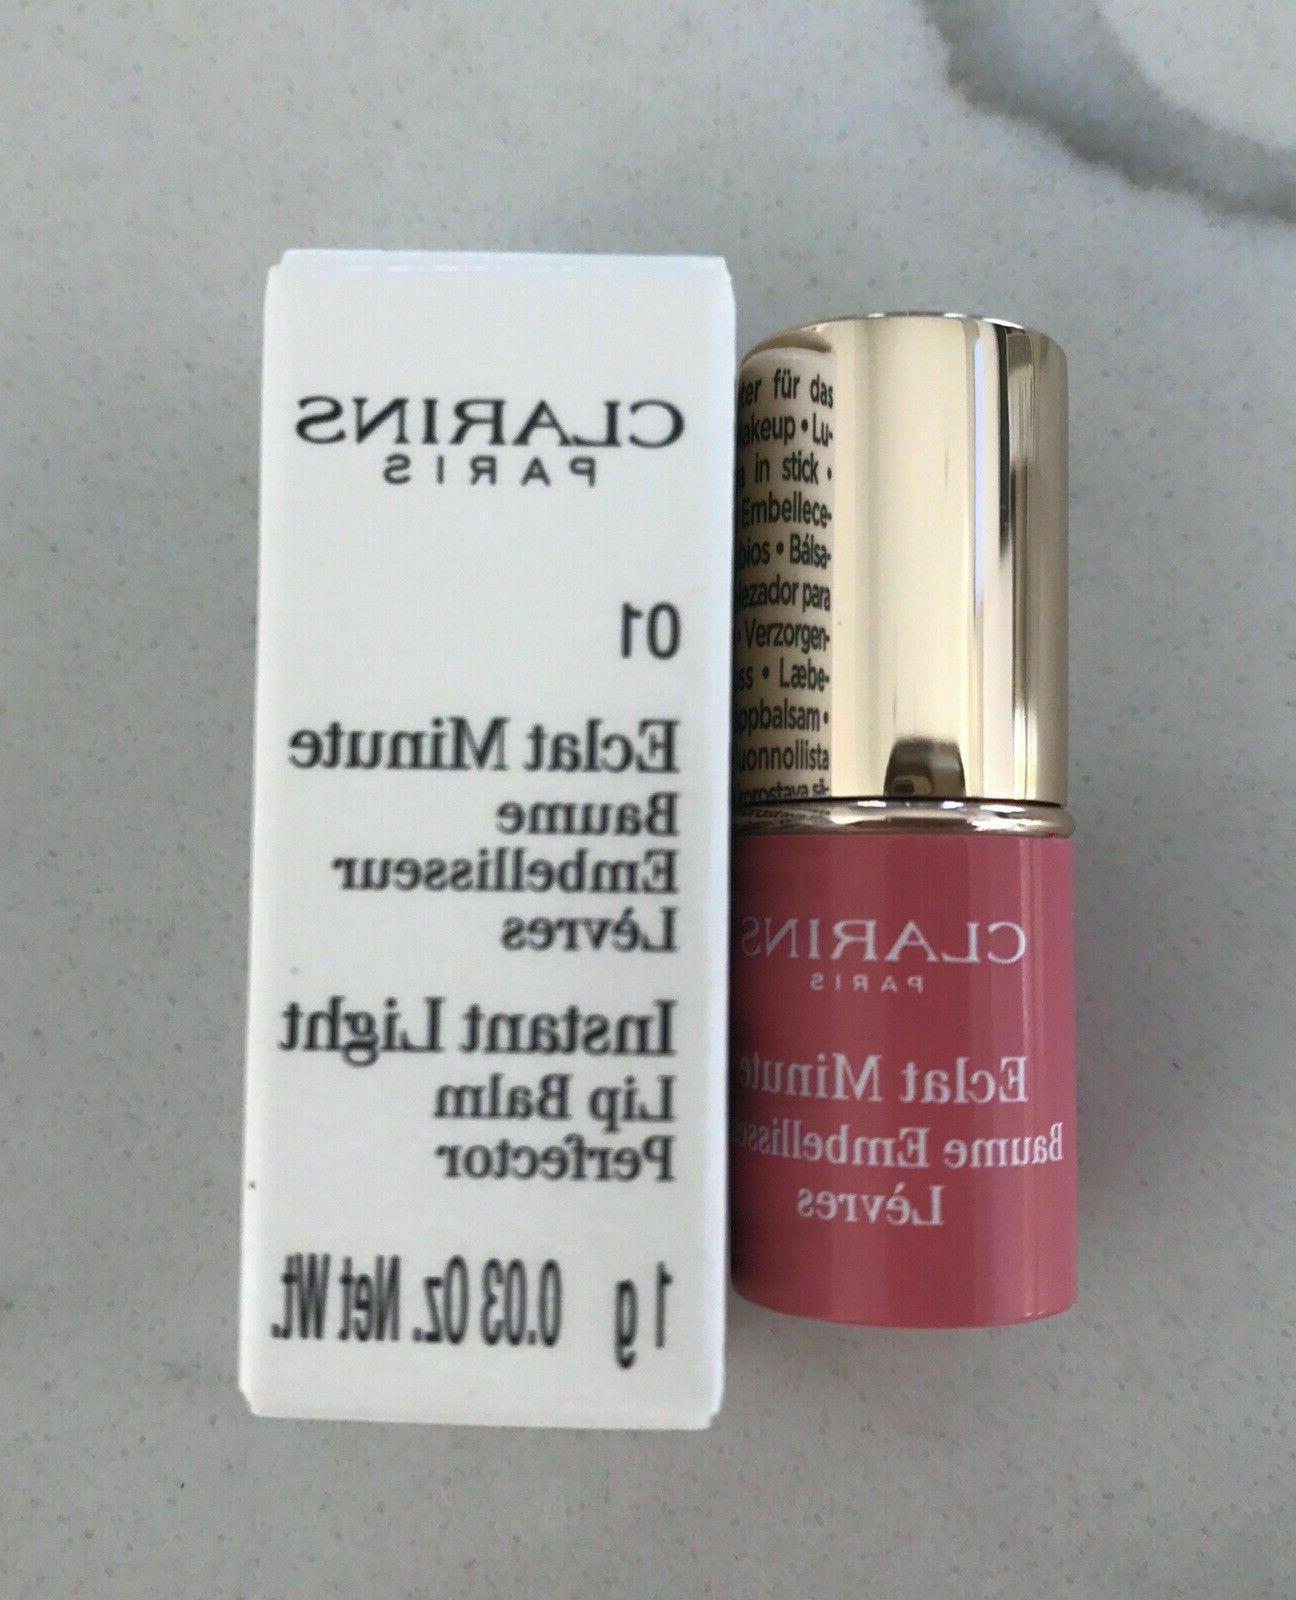 CLARINS lip balm perfector rose sample set LOT